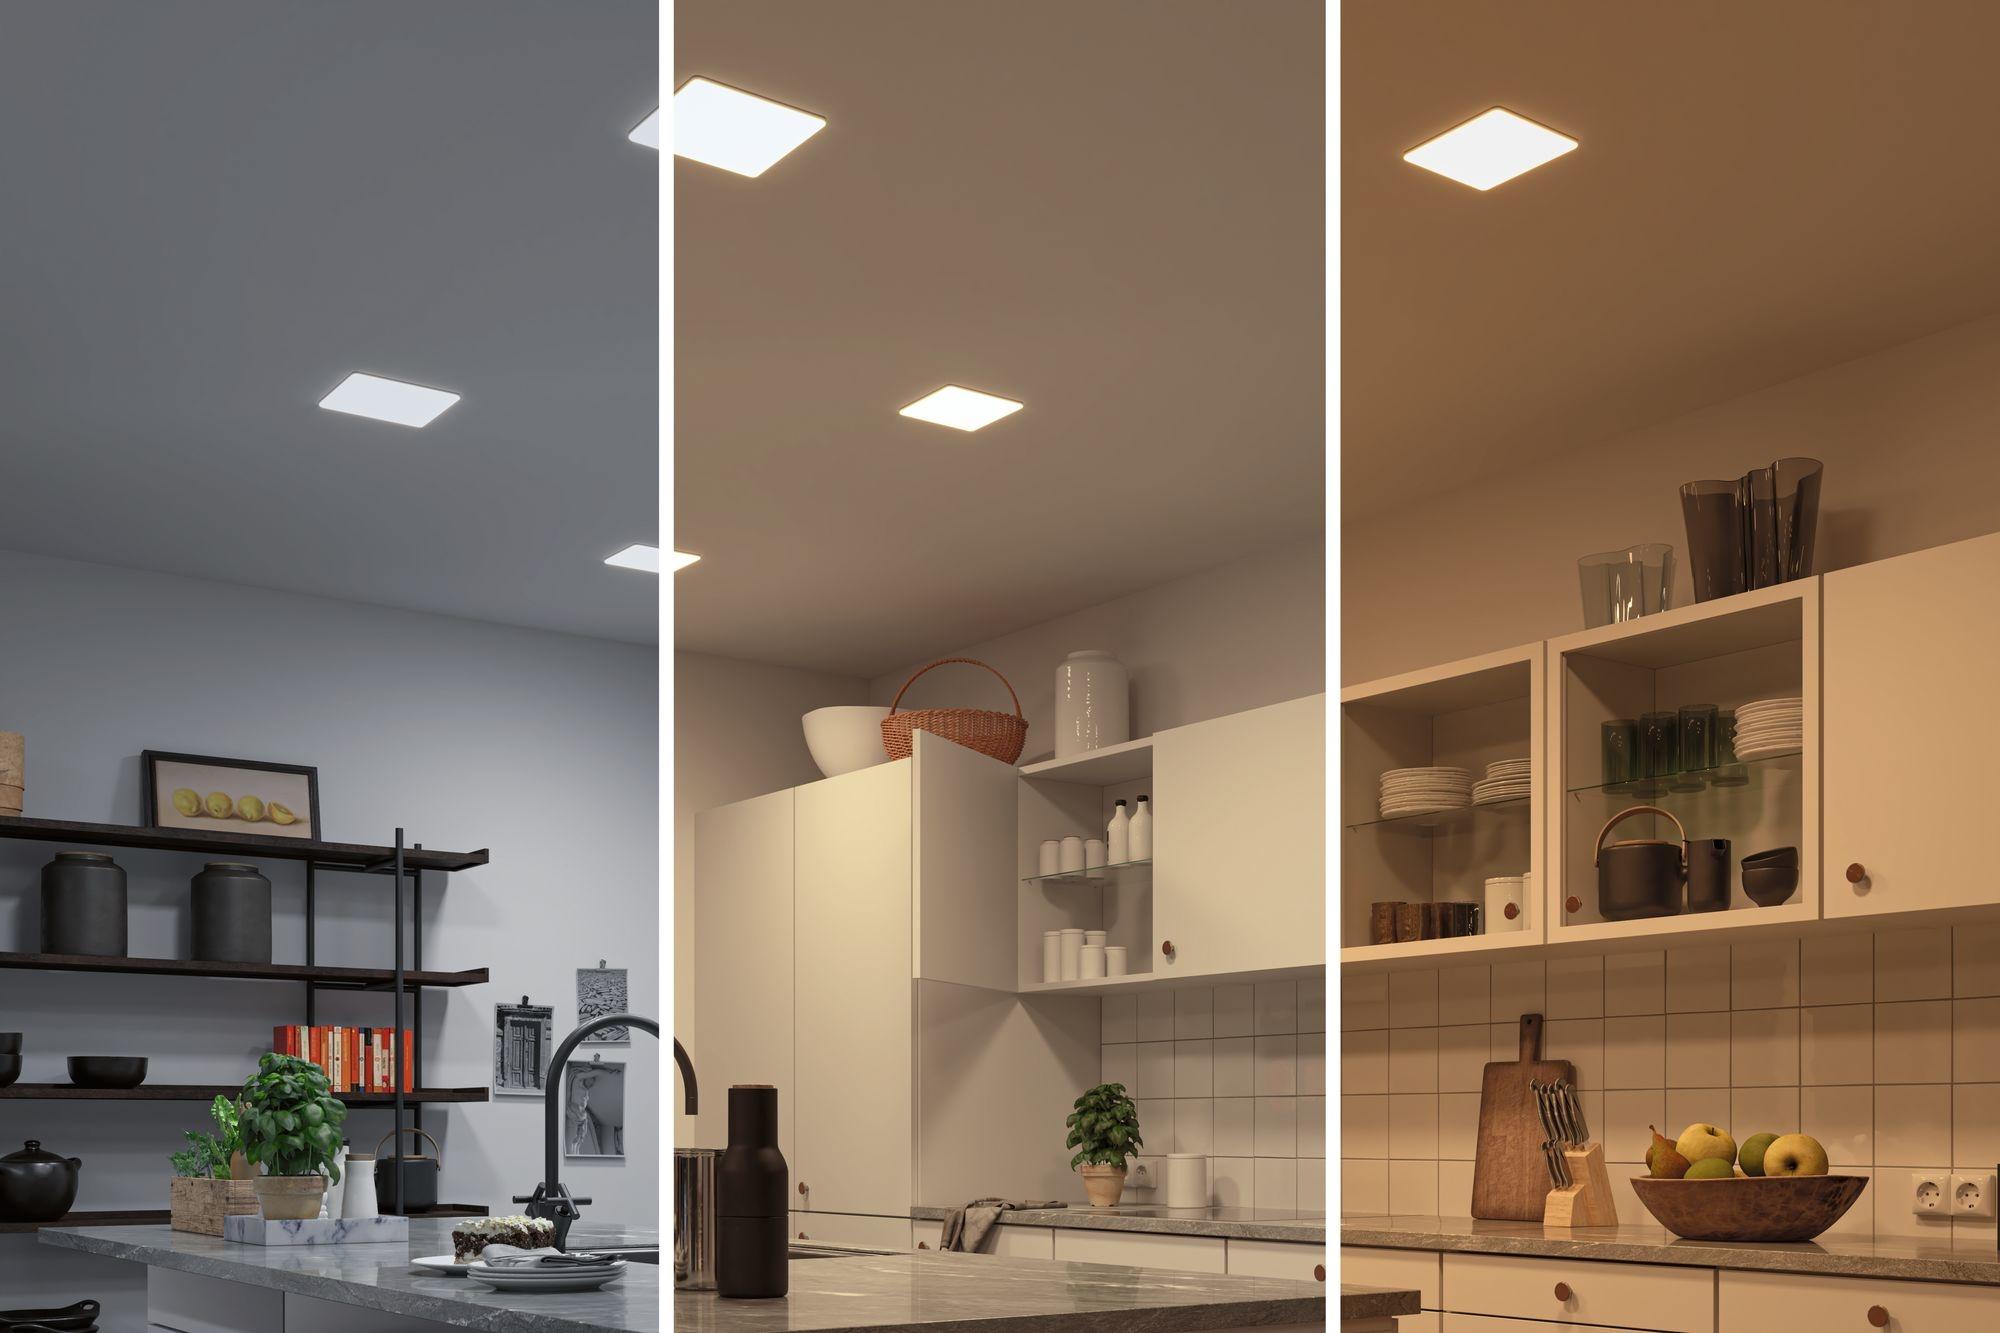 Paulmann Smart Home Zigbee LED Einbaupanel Veluna VariFit Tunable White 215mm x 215mm IP44 17W